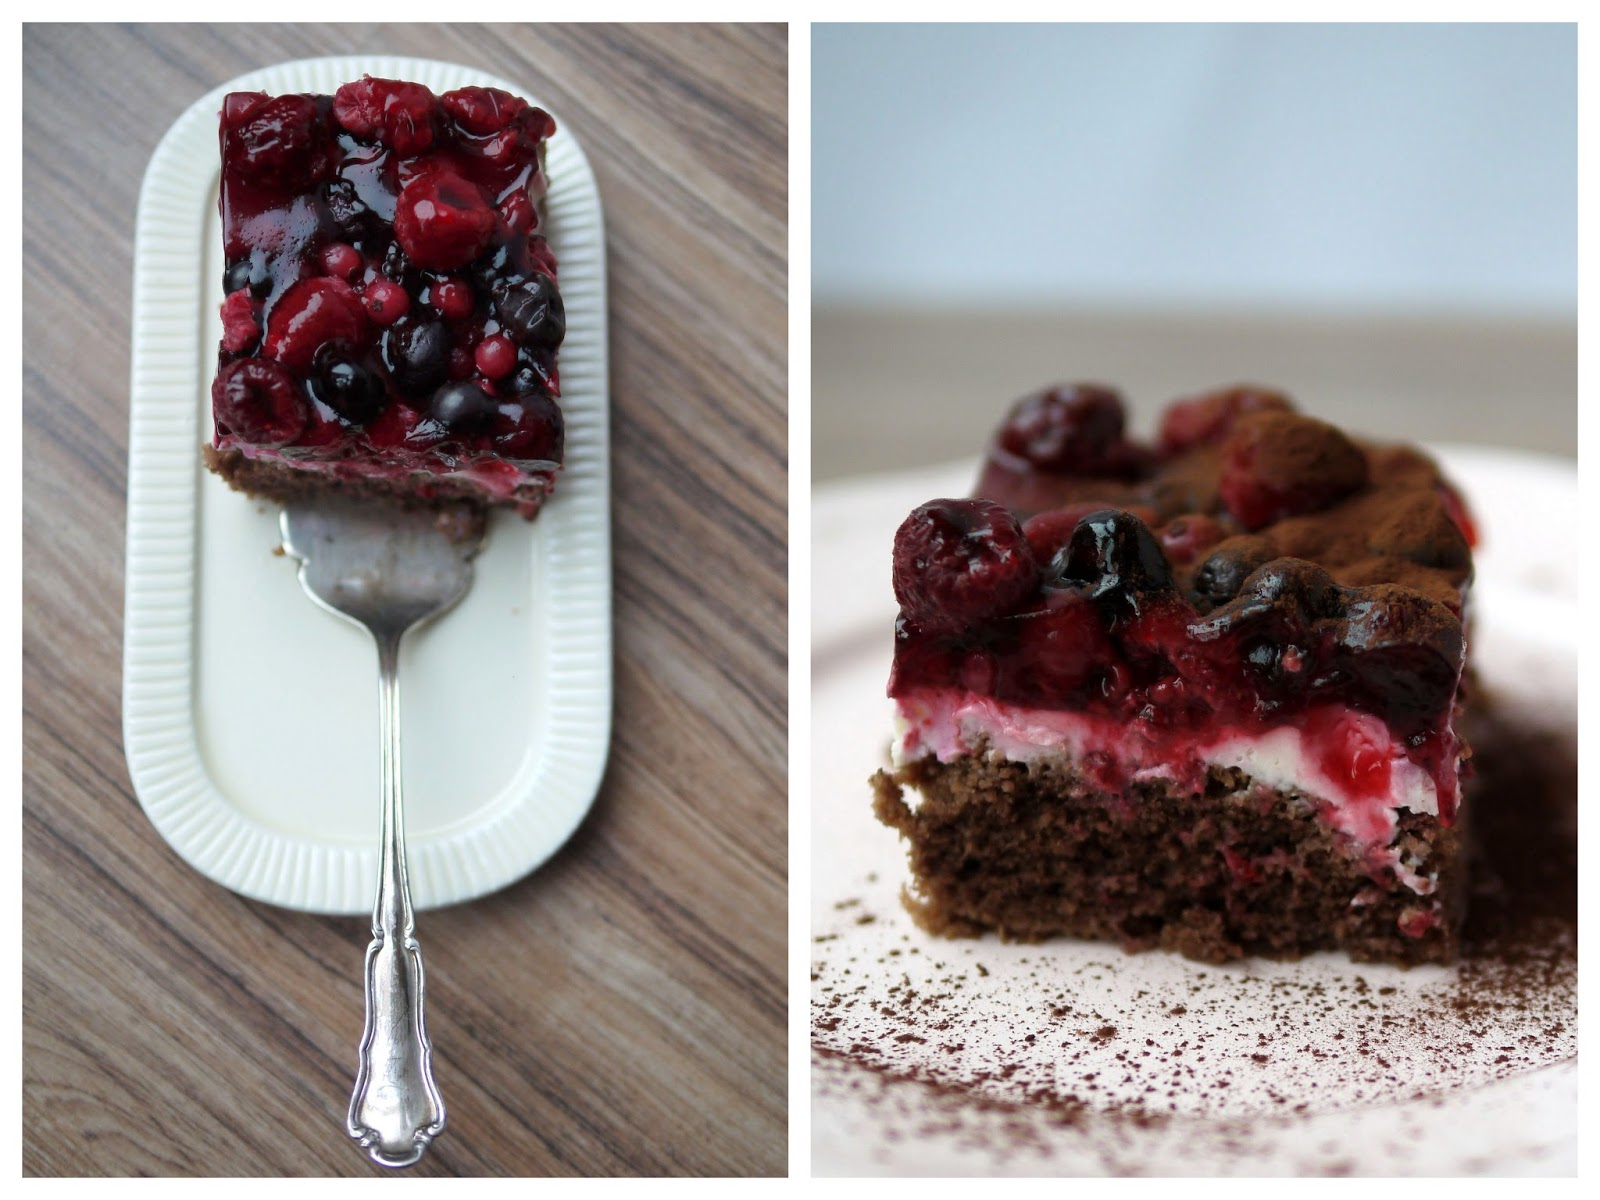 Beeren-Schoko-Kuchen mit Mascarpone | Backen | Kuchen | Blechkuchen | Rezept